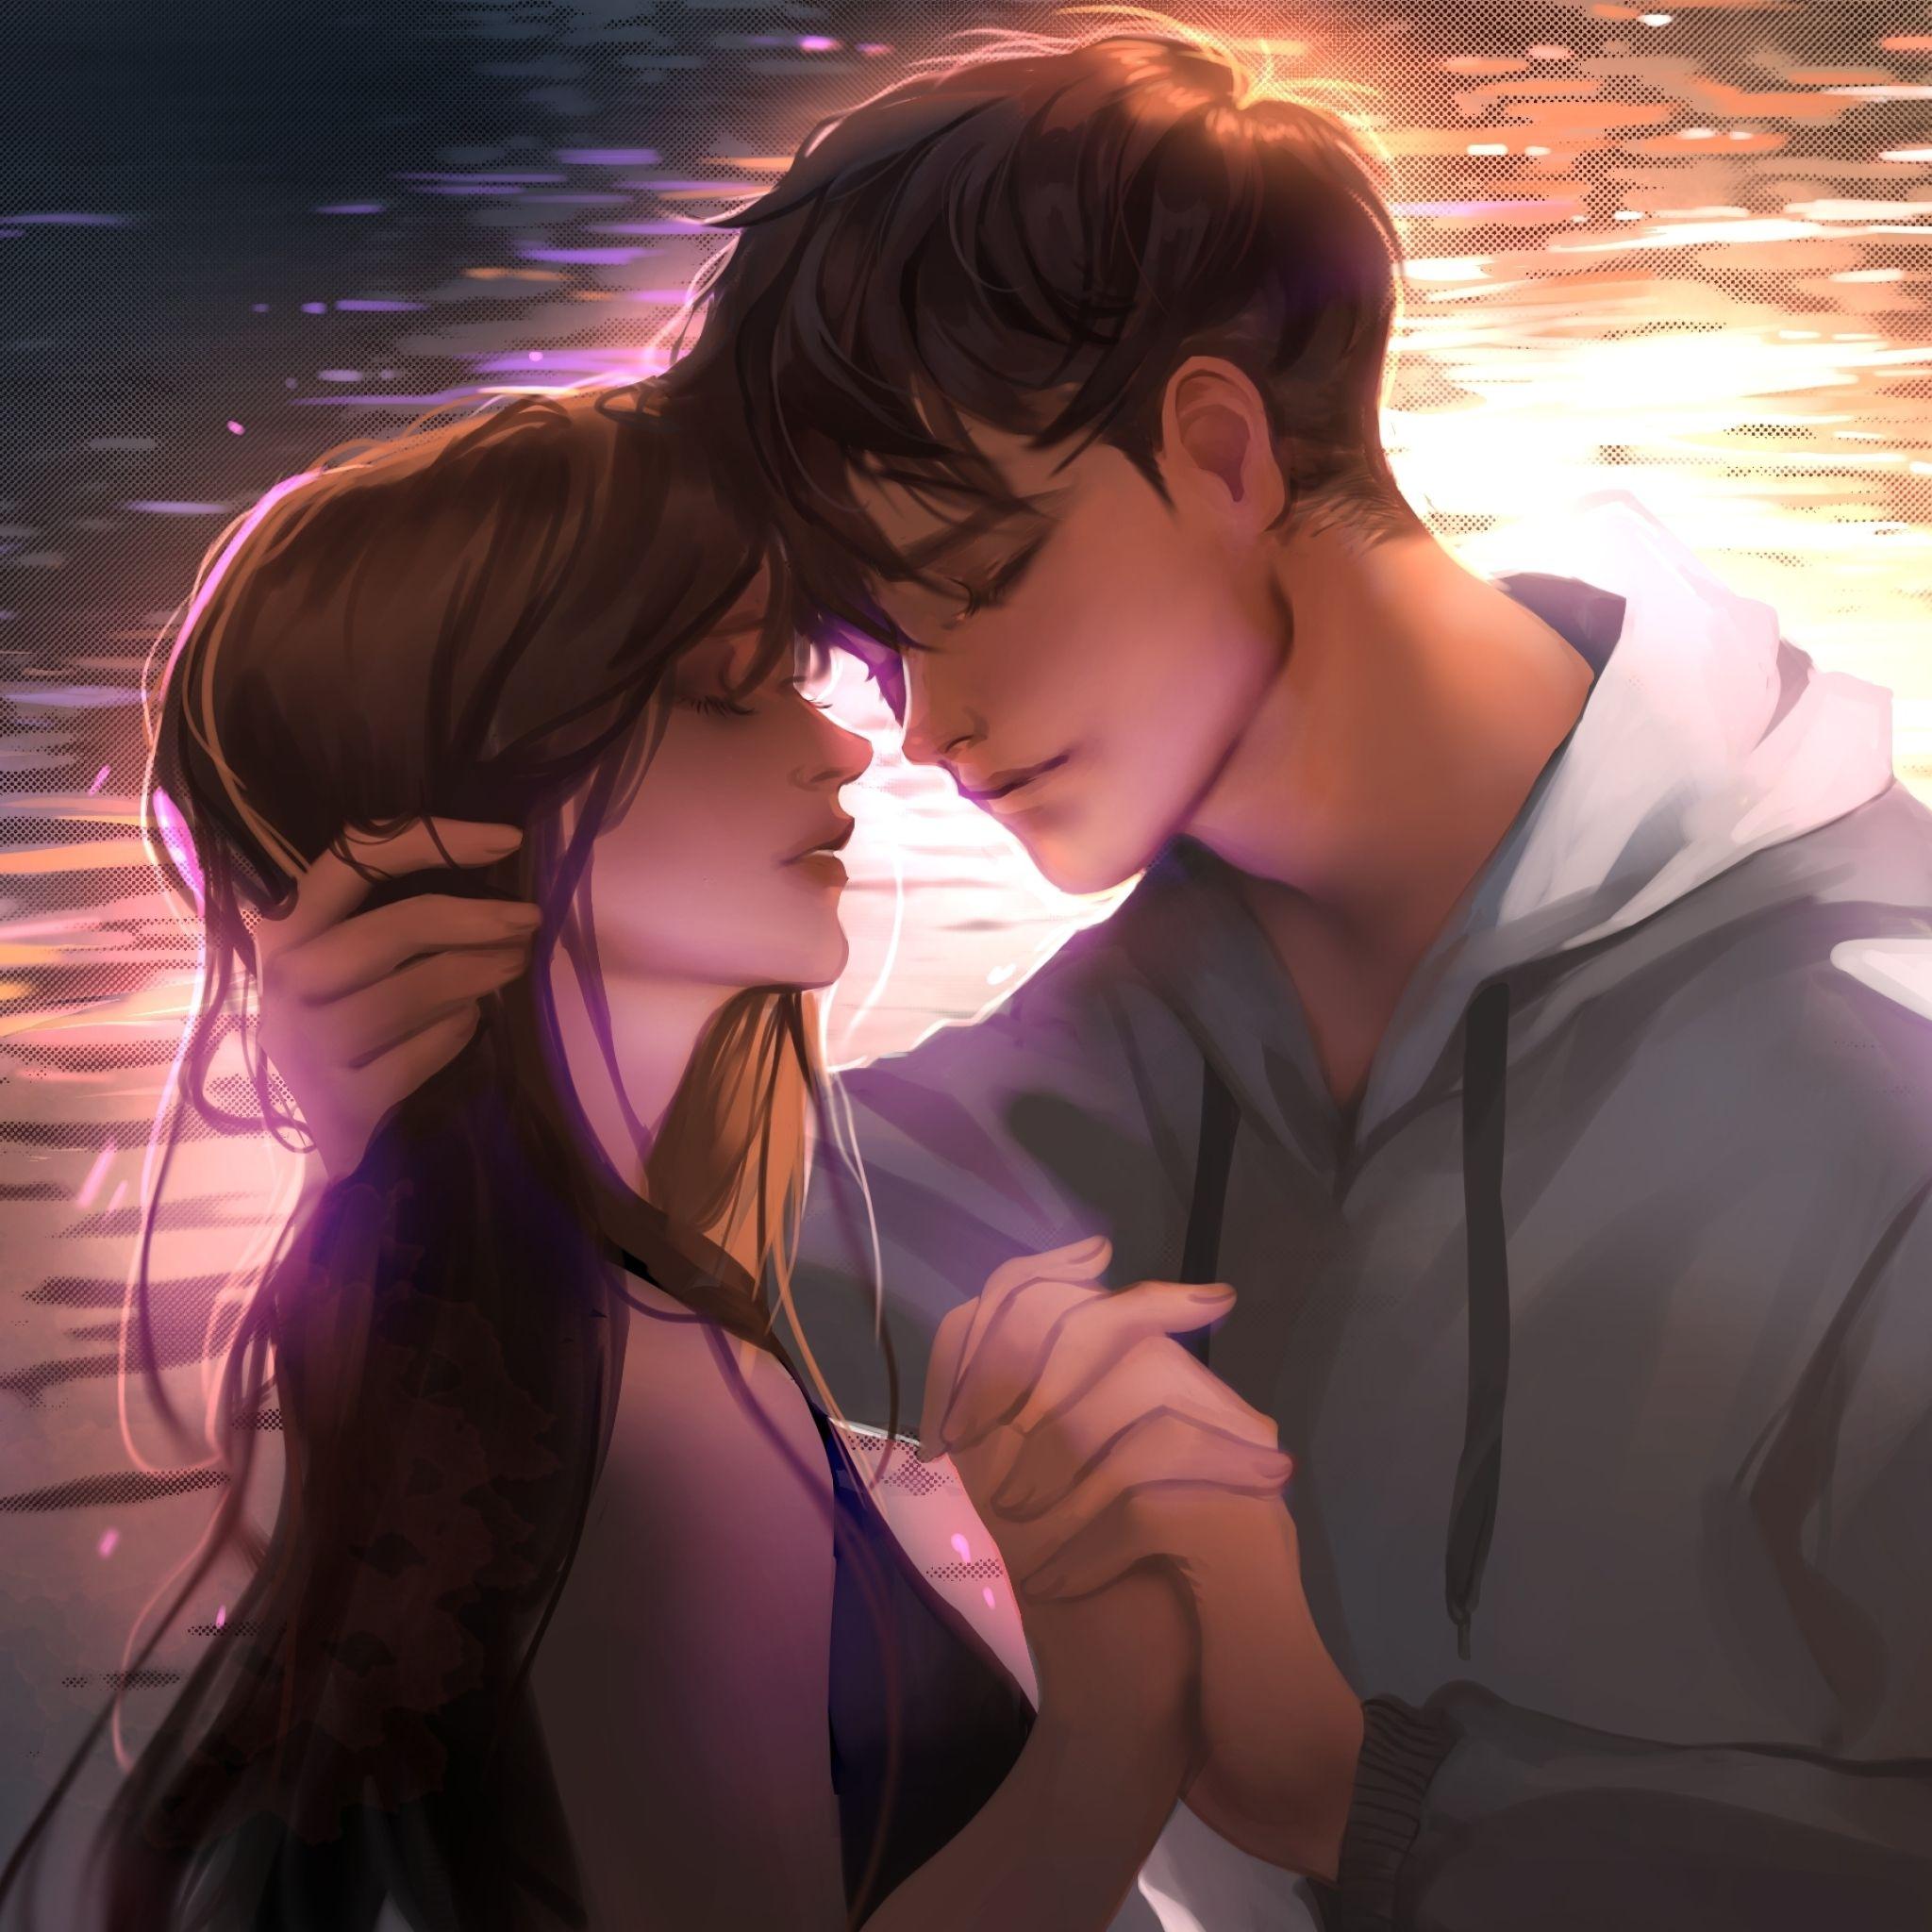 Anime Romance Kiss Wallpapers - Wallpaper Cave